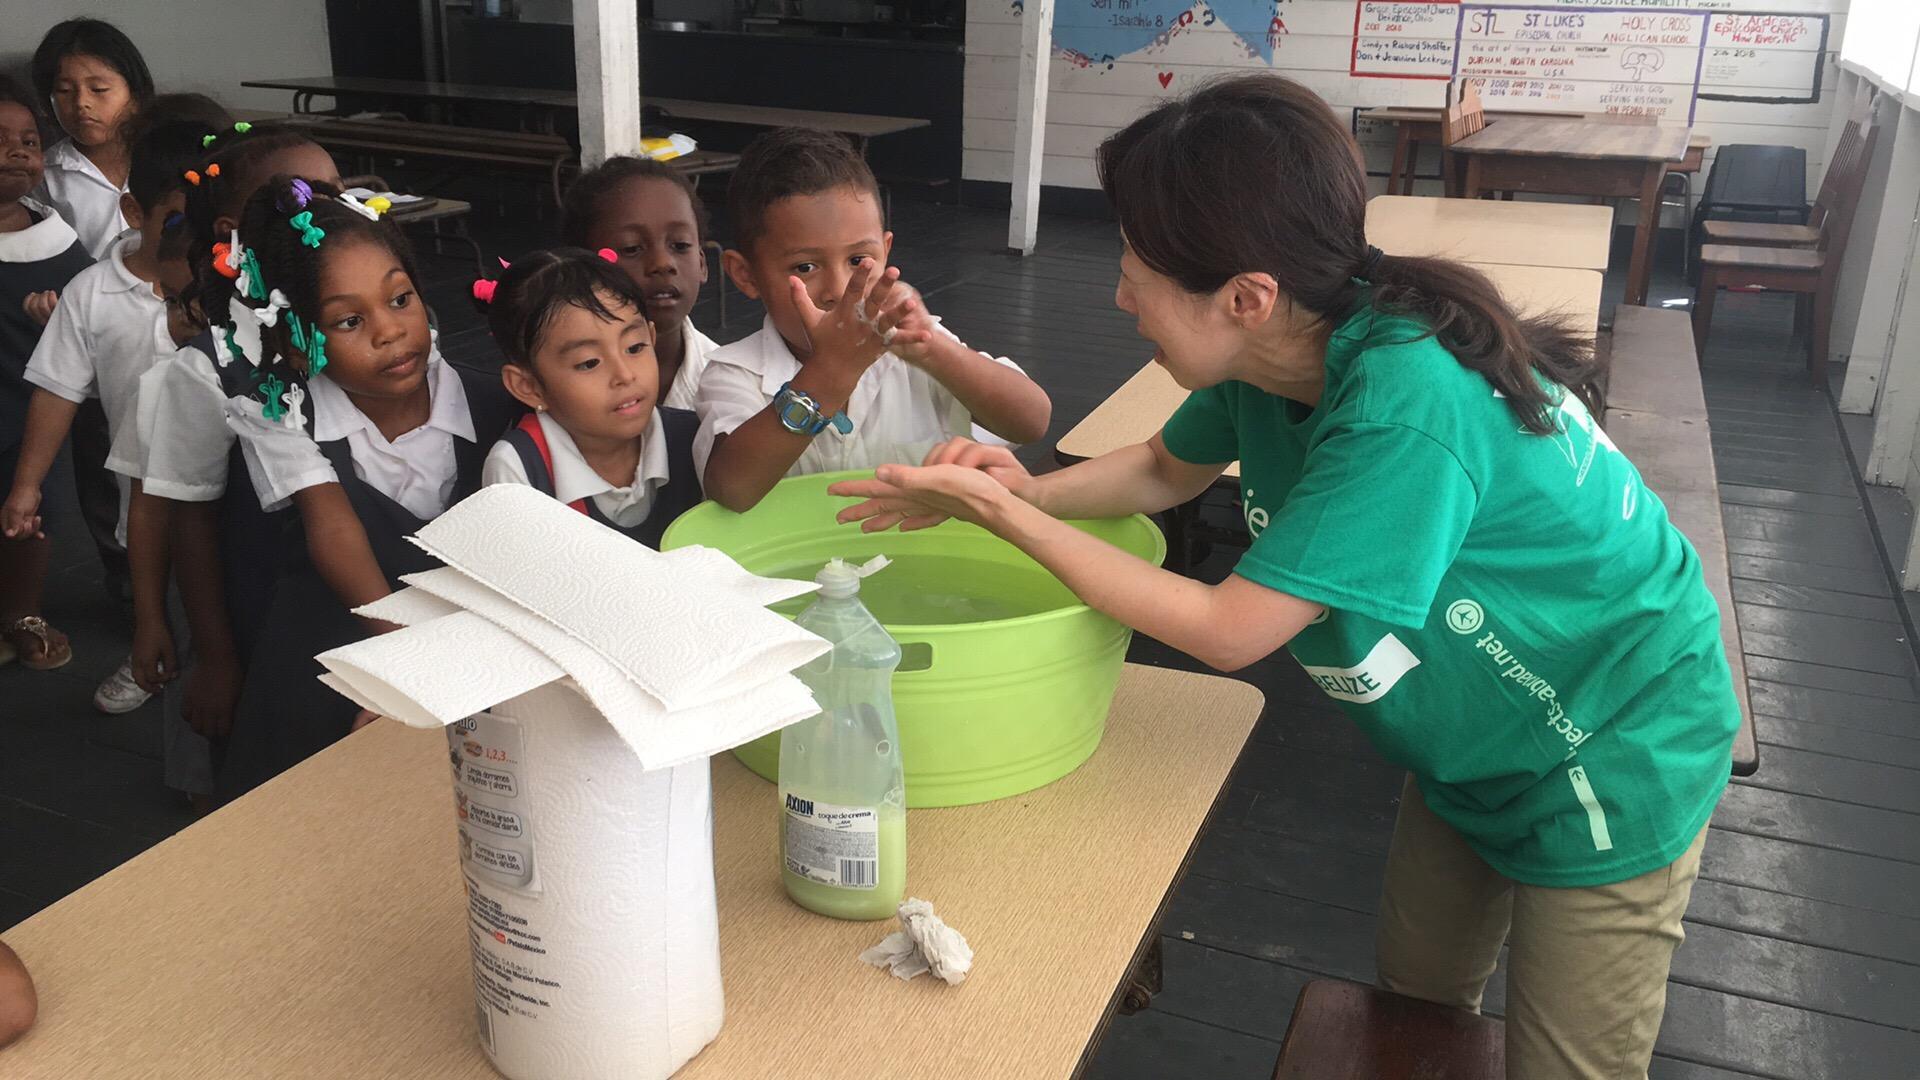 A intern demonstrates thorough handwashing during her Public Health internship in Belize for groups.